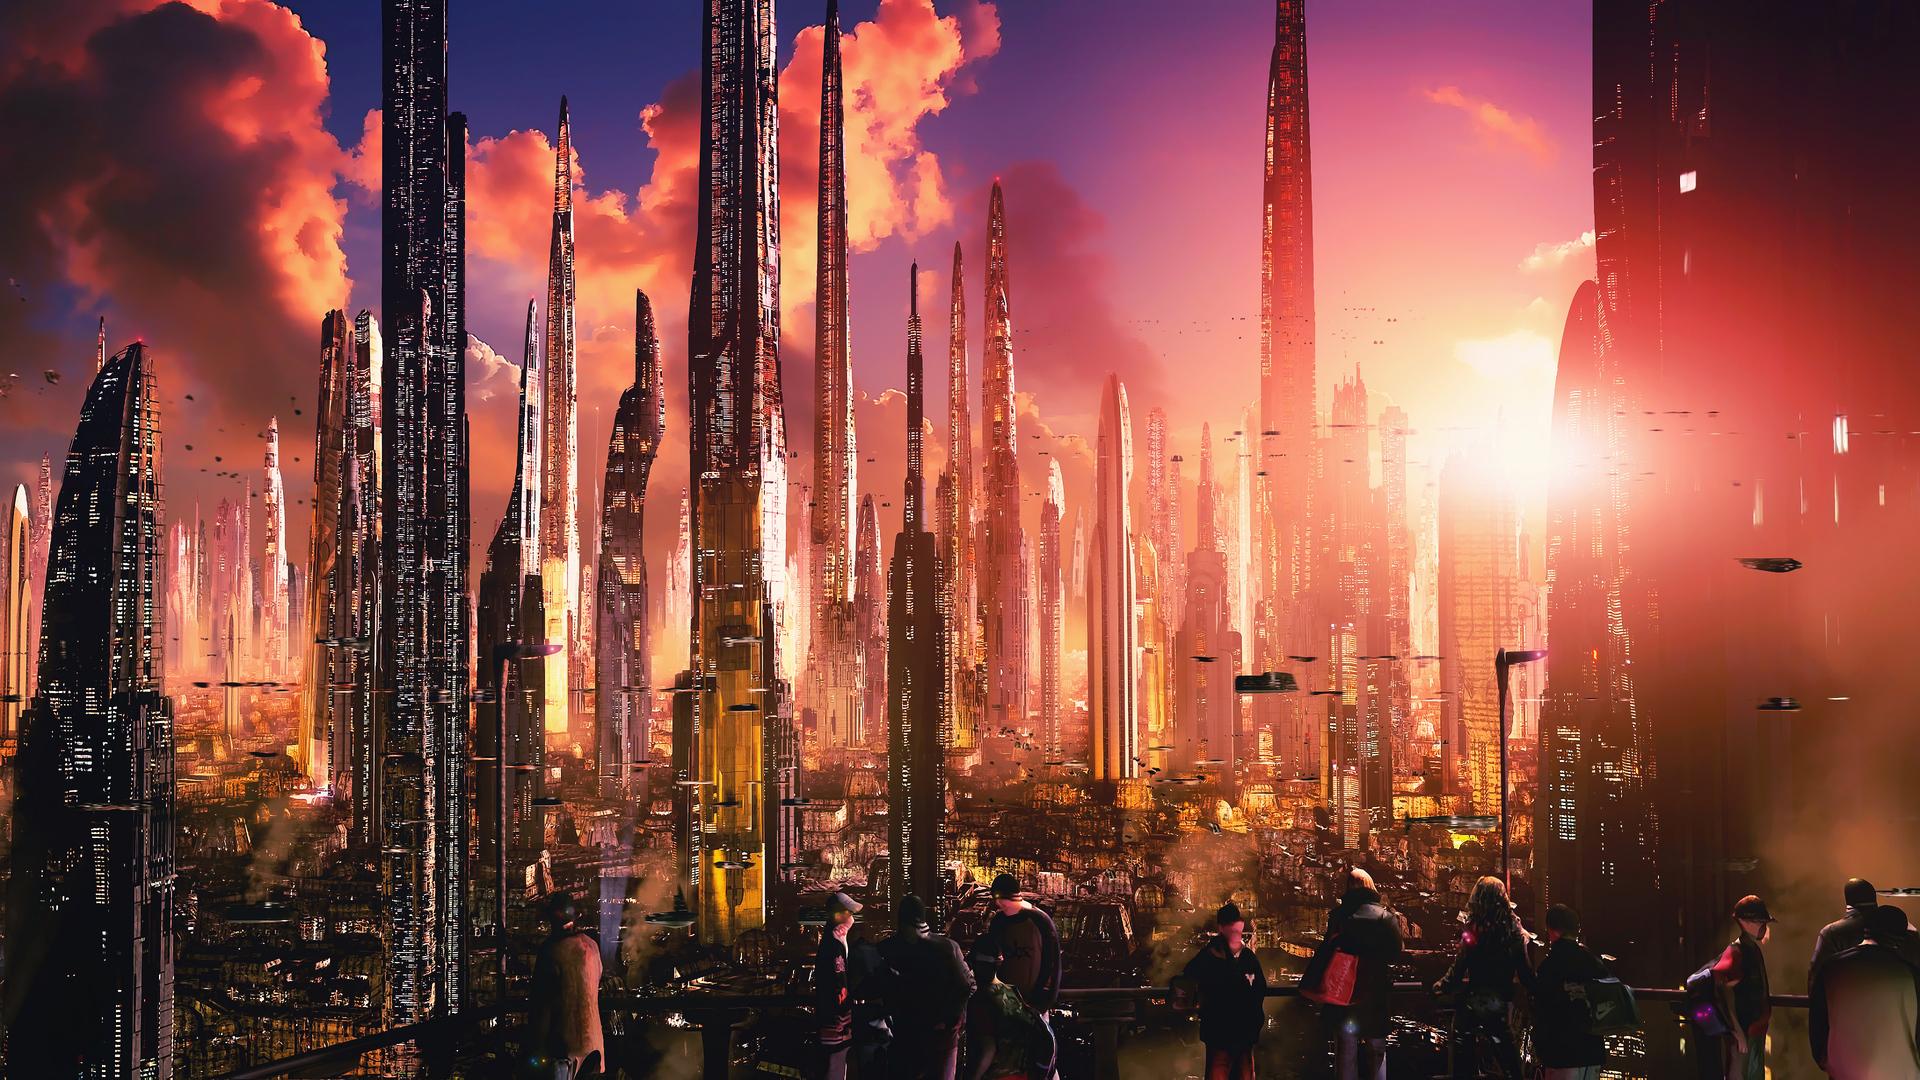 Futuristic City Tall Buildings Concept Art 4k 8o